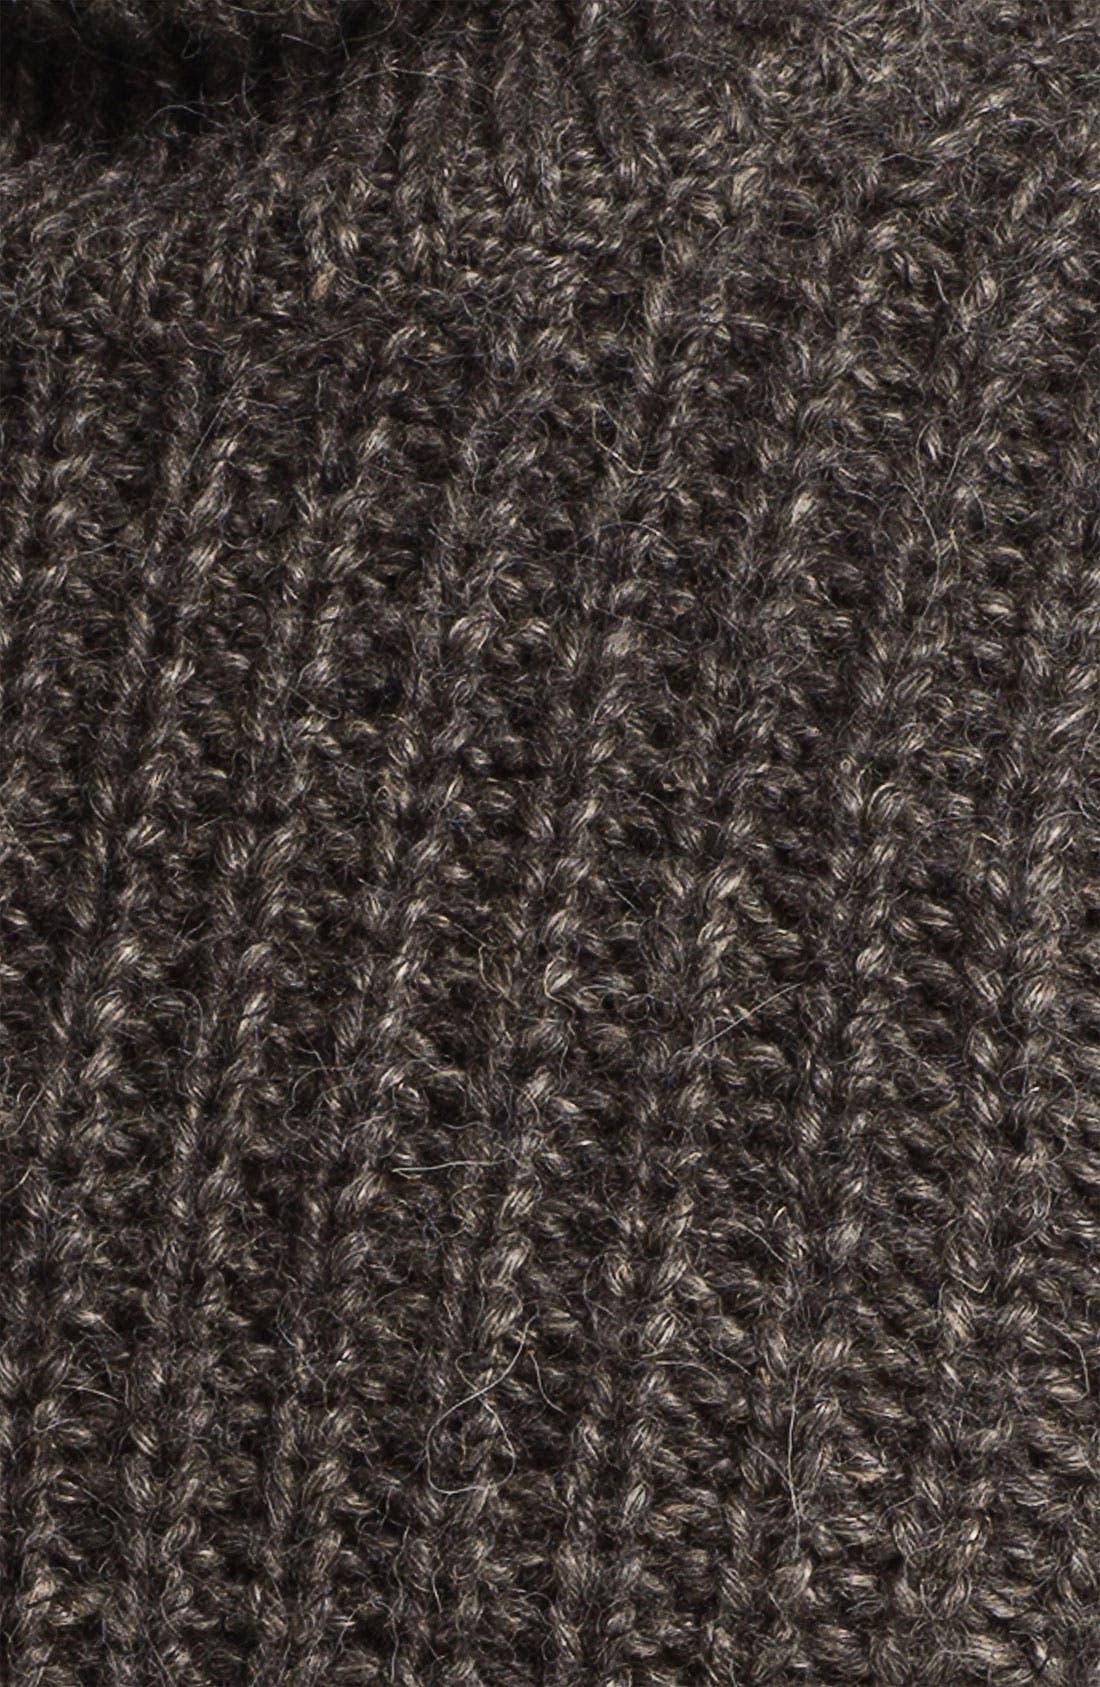 MICHAEL KORS,                             Alpaca Blend Turtleneck Sweater,                             Alternate thumbnail 2, color,                             029